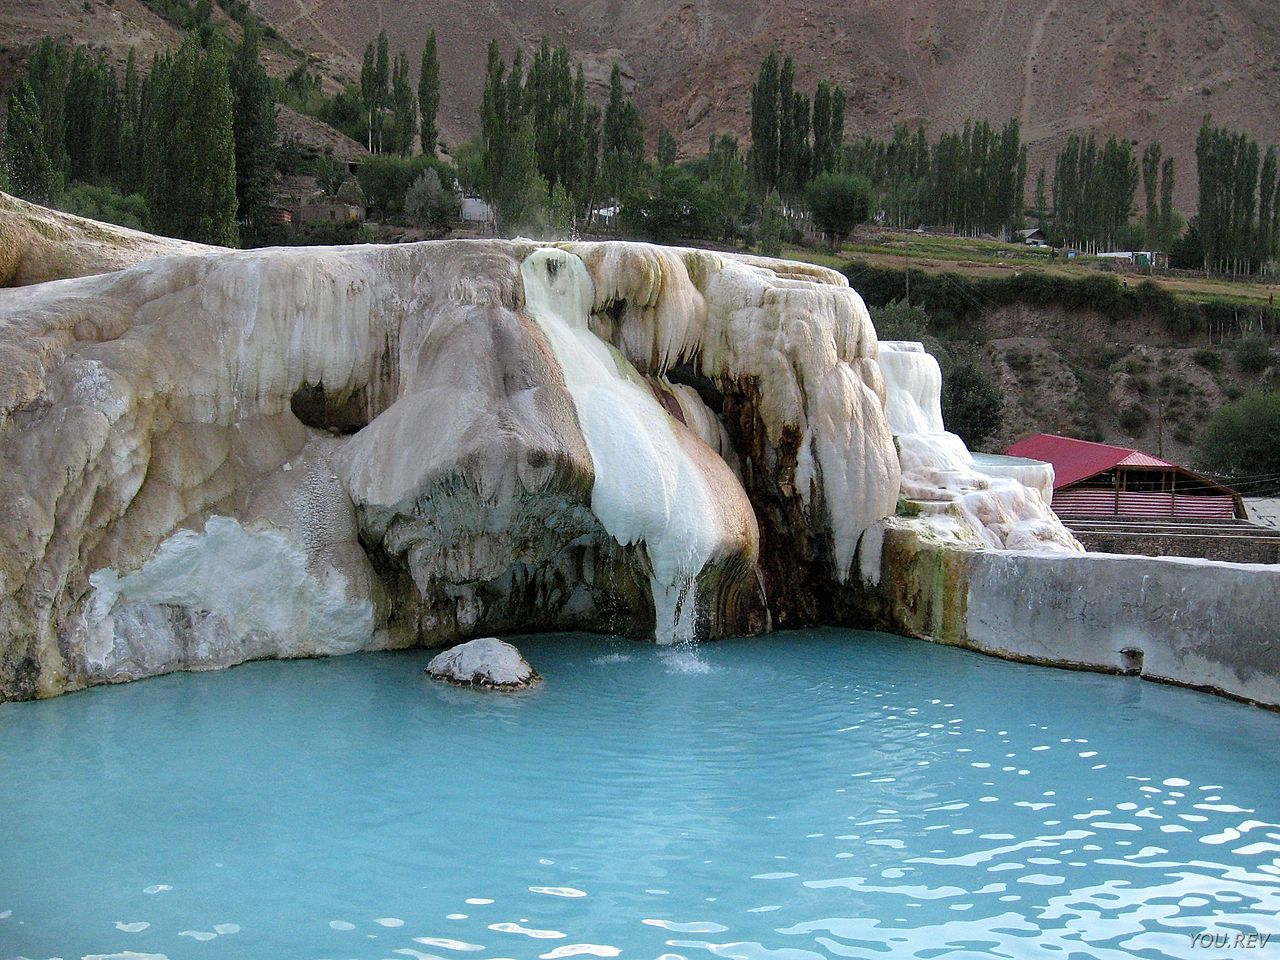 Garmchashma hot springs in Pamir에 대한 이미지 검색결과